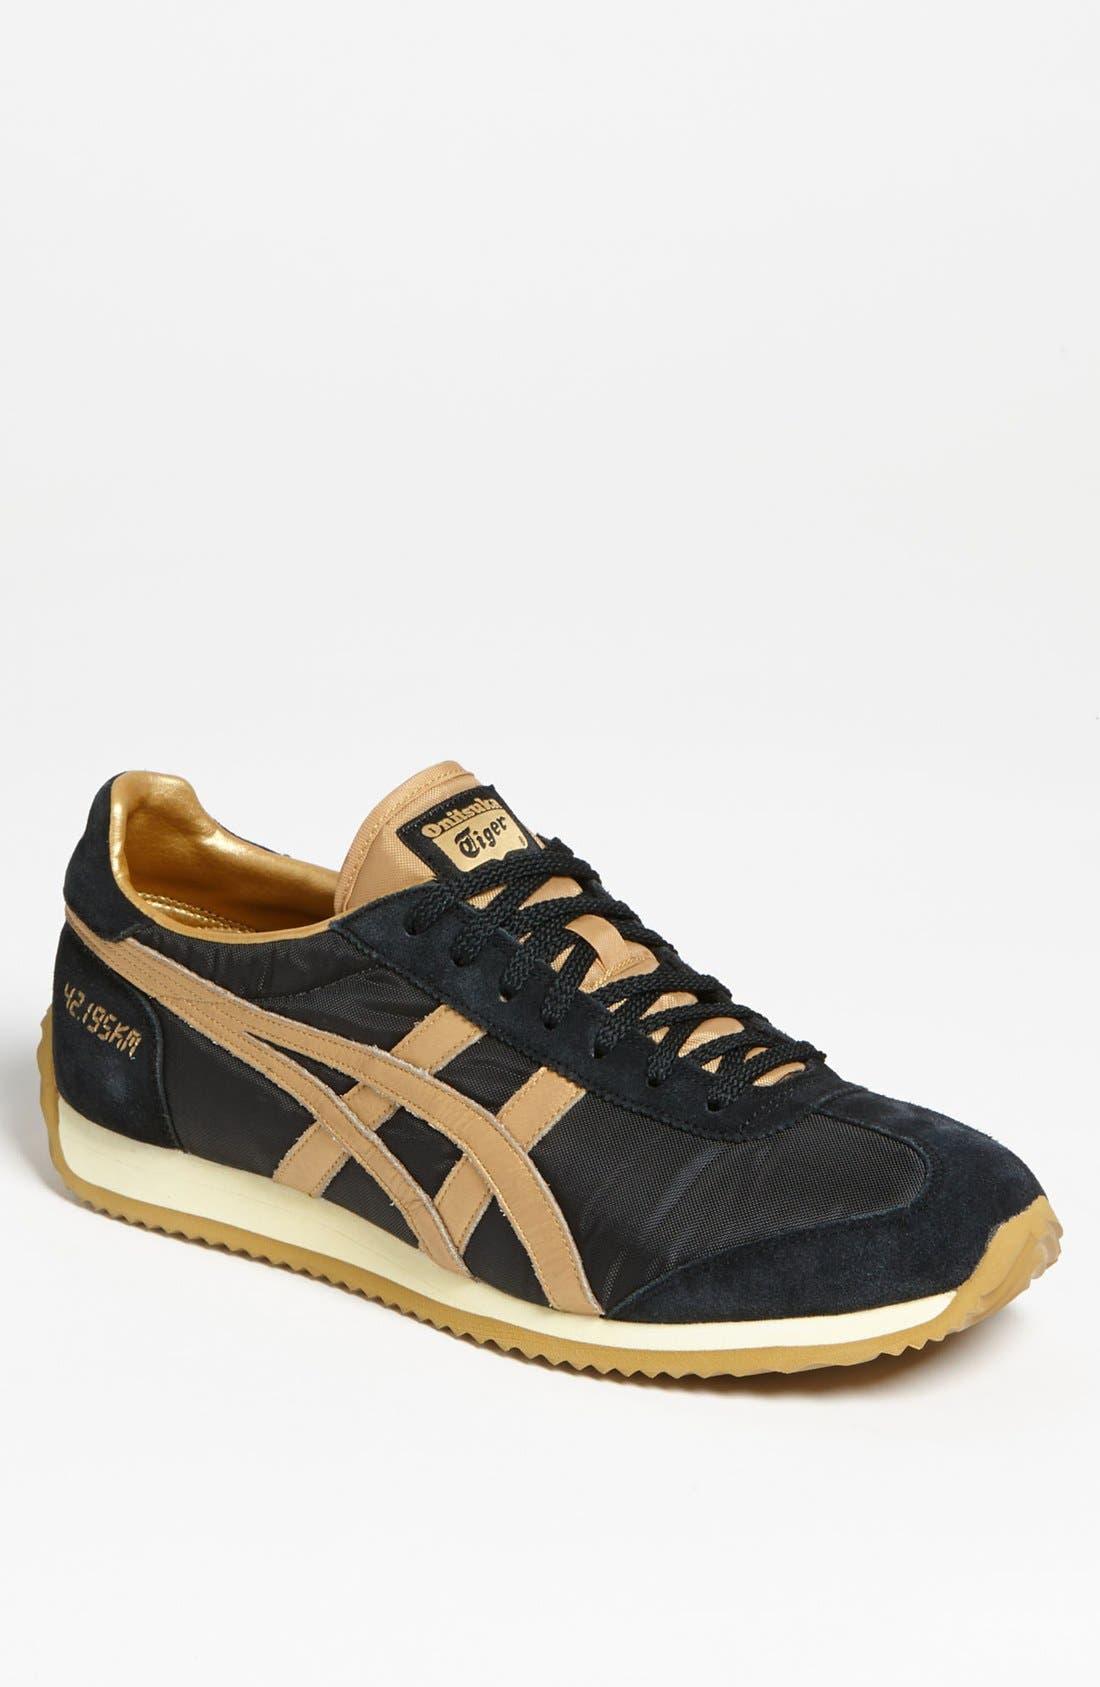 Main Image - Onitsuka Tiger™ 'California 78 OG' Sneaker (Men)